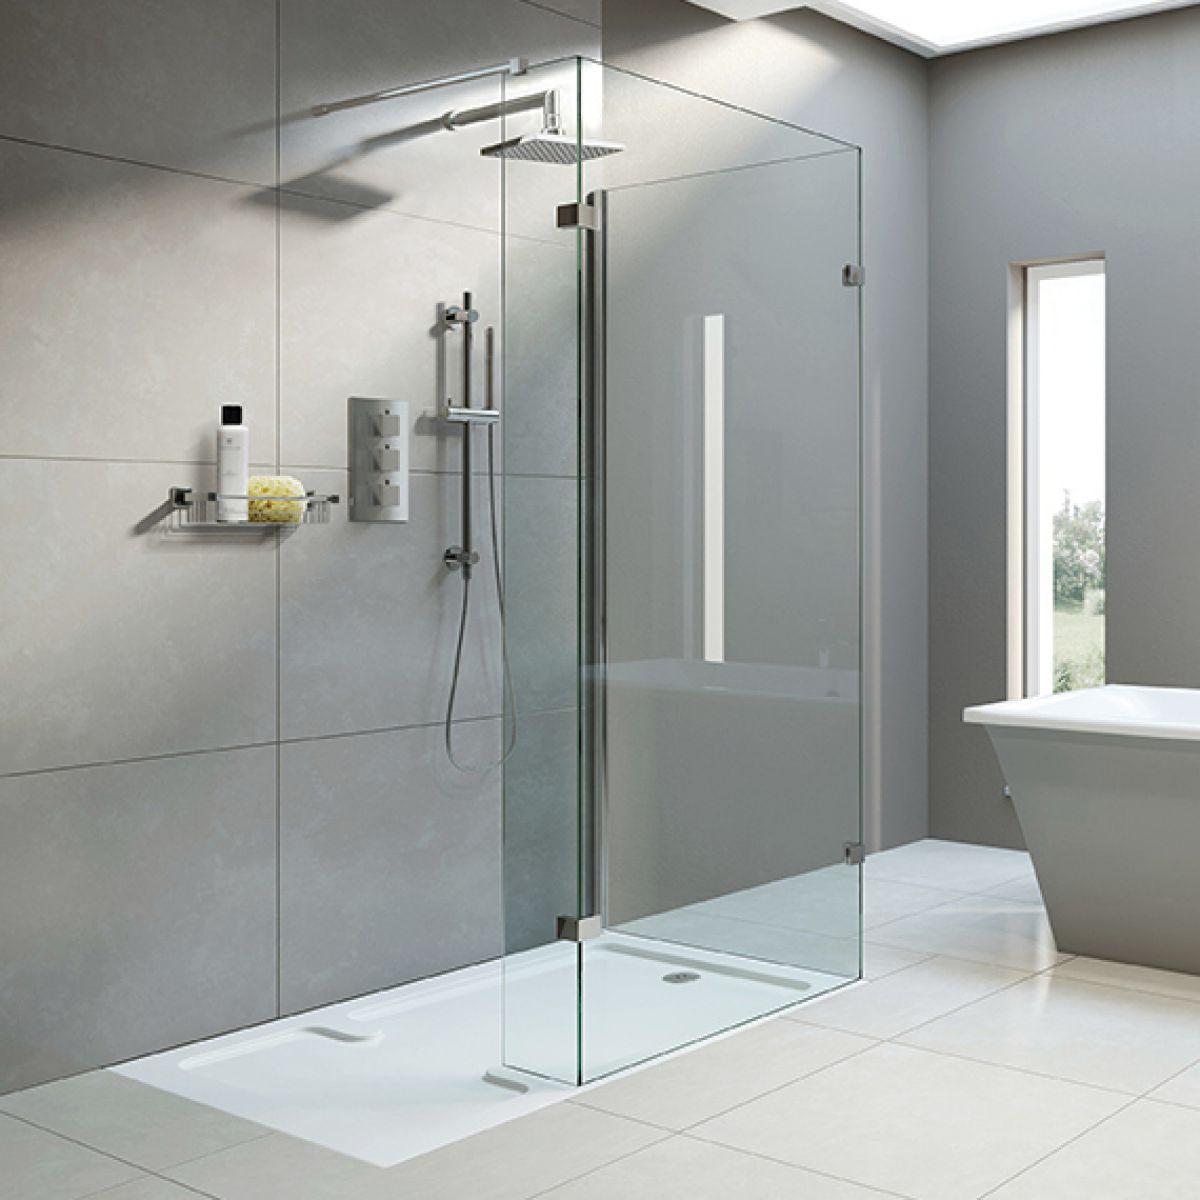 Aqata Spectra Sp430 Walk In Shower Uk Bathrooms